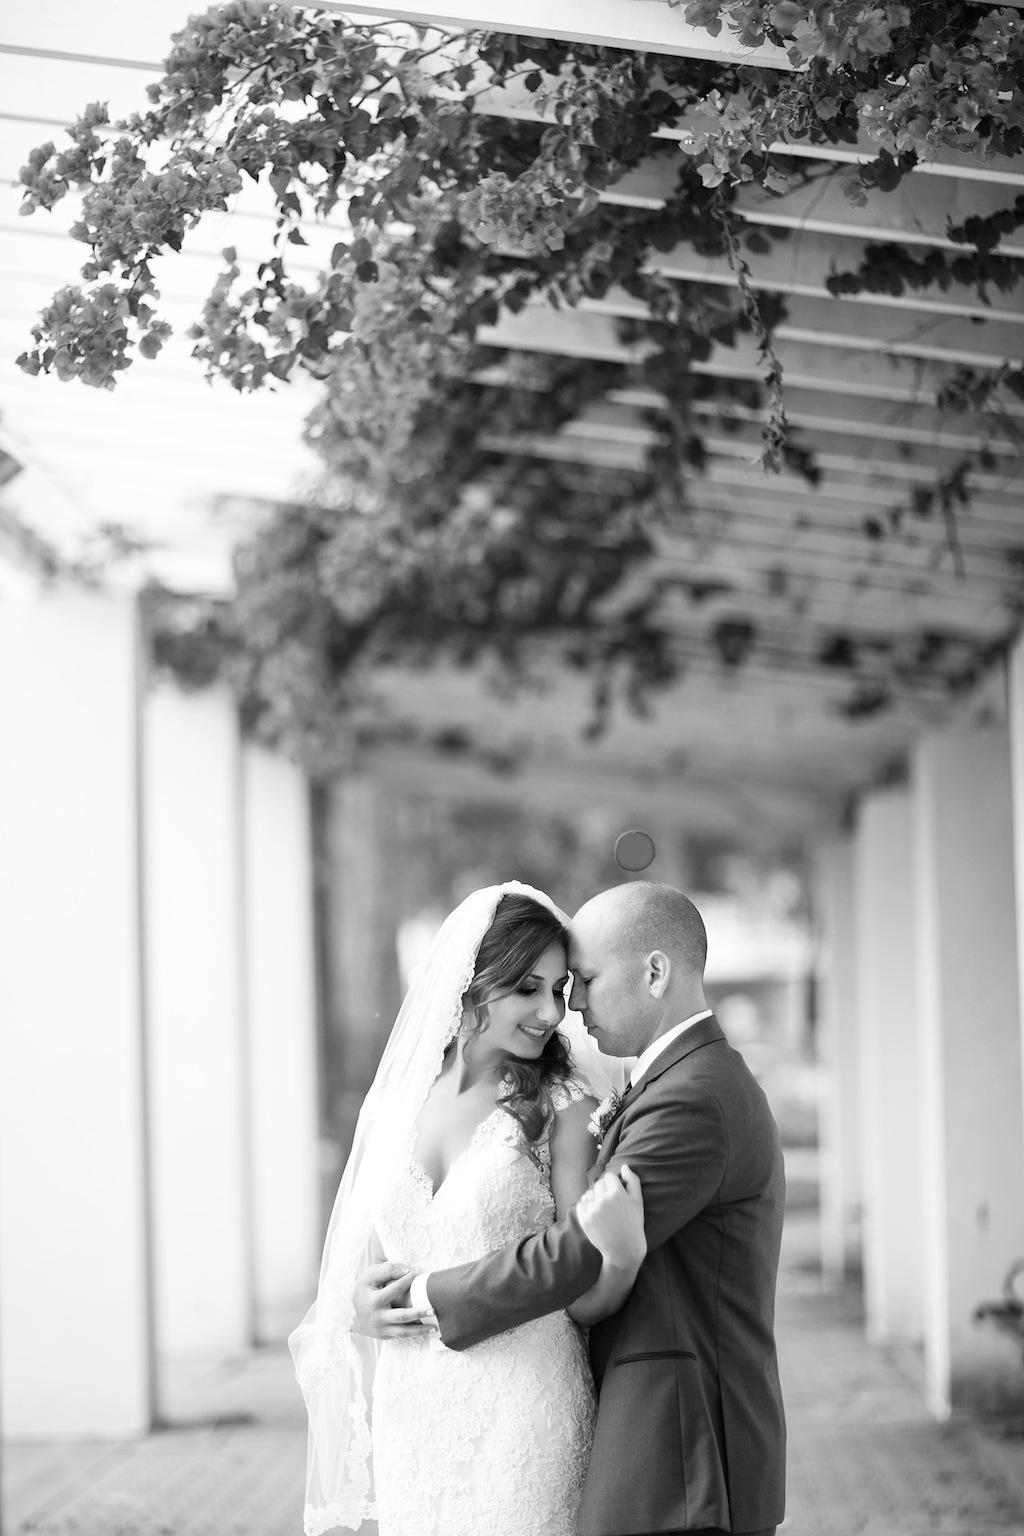 Downtown St. Pete Wedding - Birchwood Wedding - North Straub Park Wedding - Jenn Hopkins Photography (44)